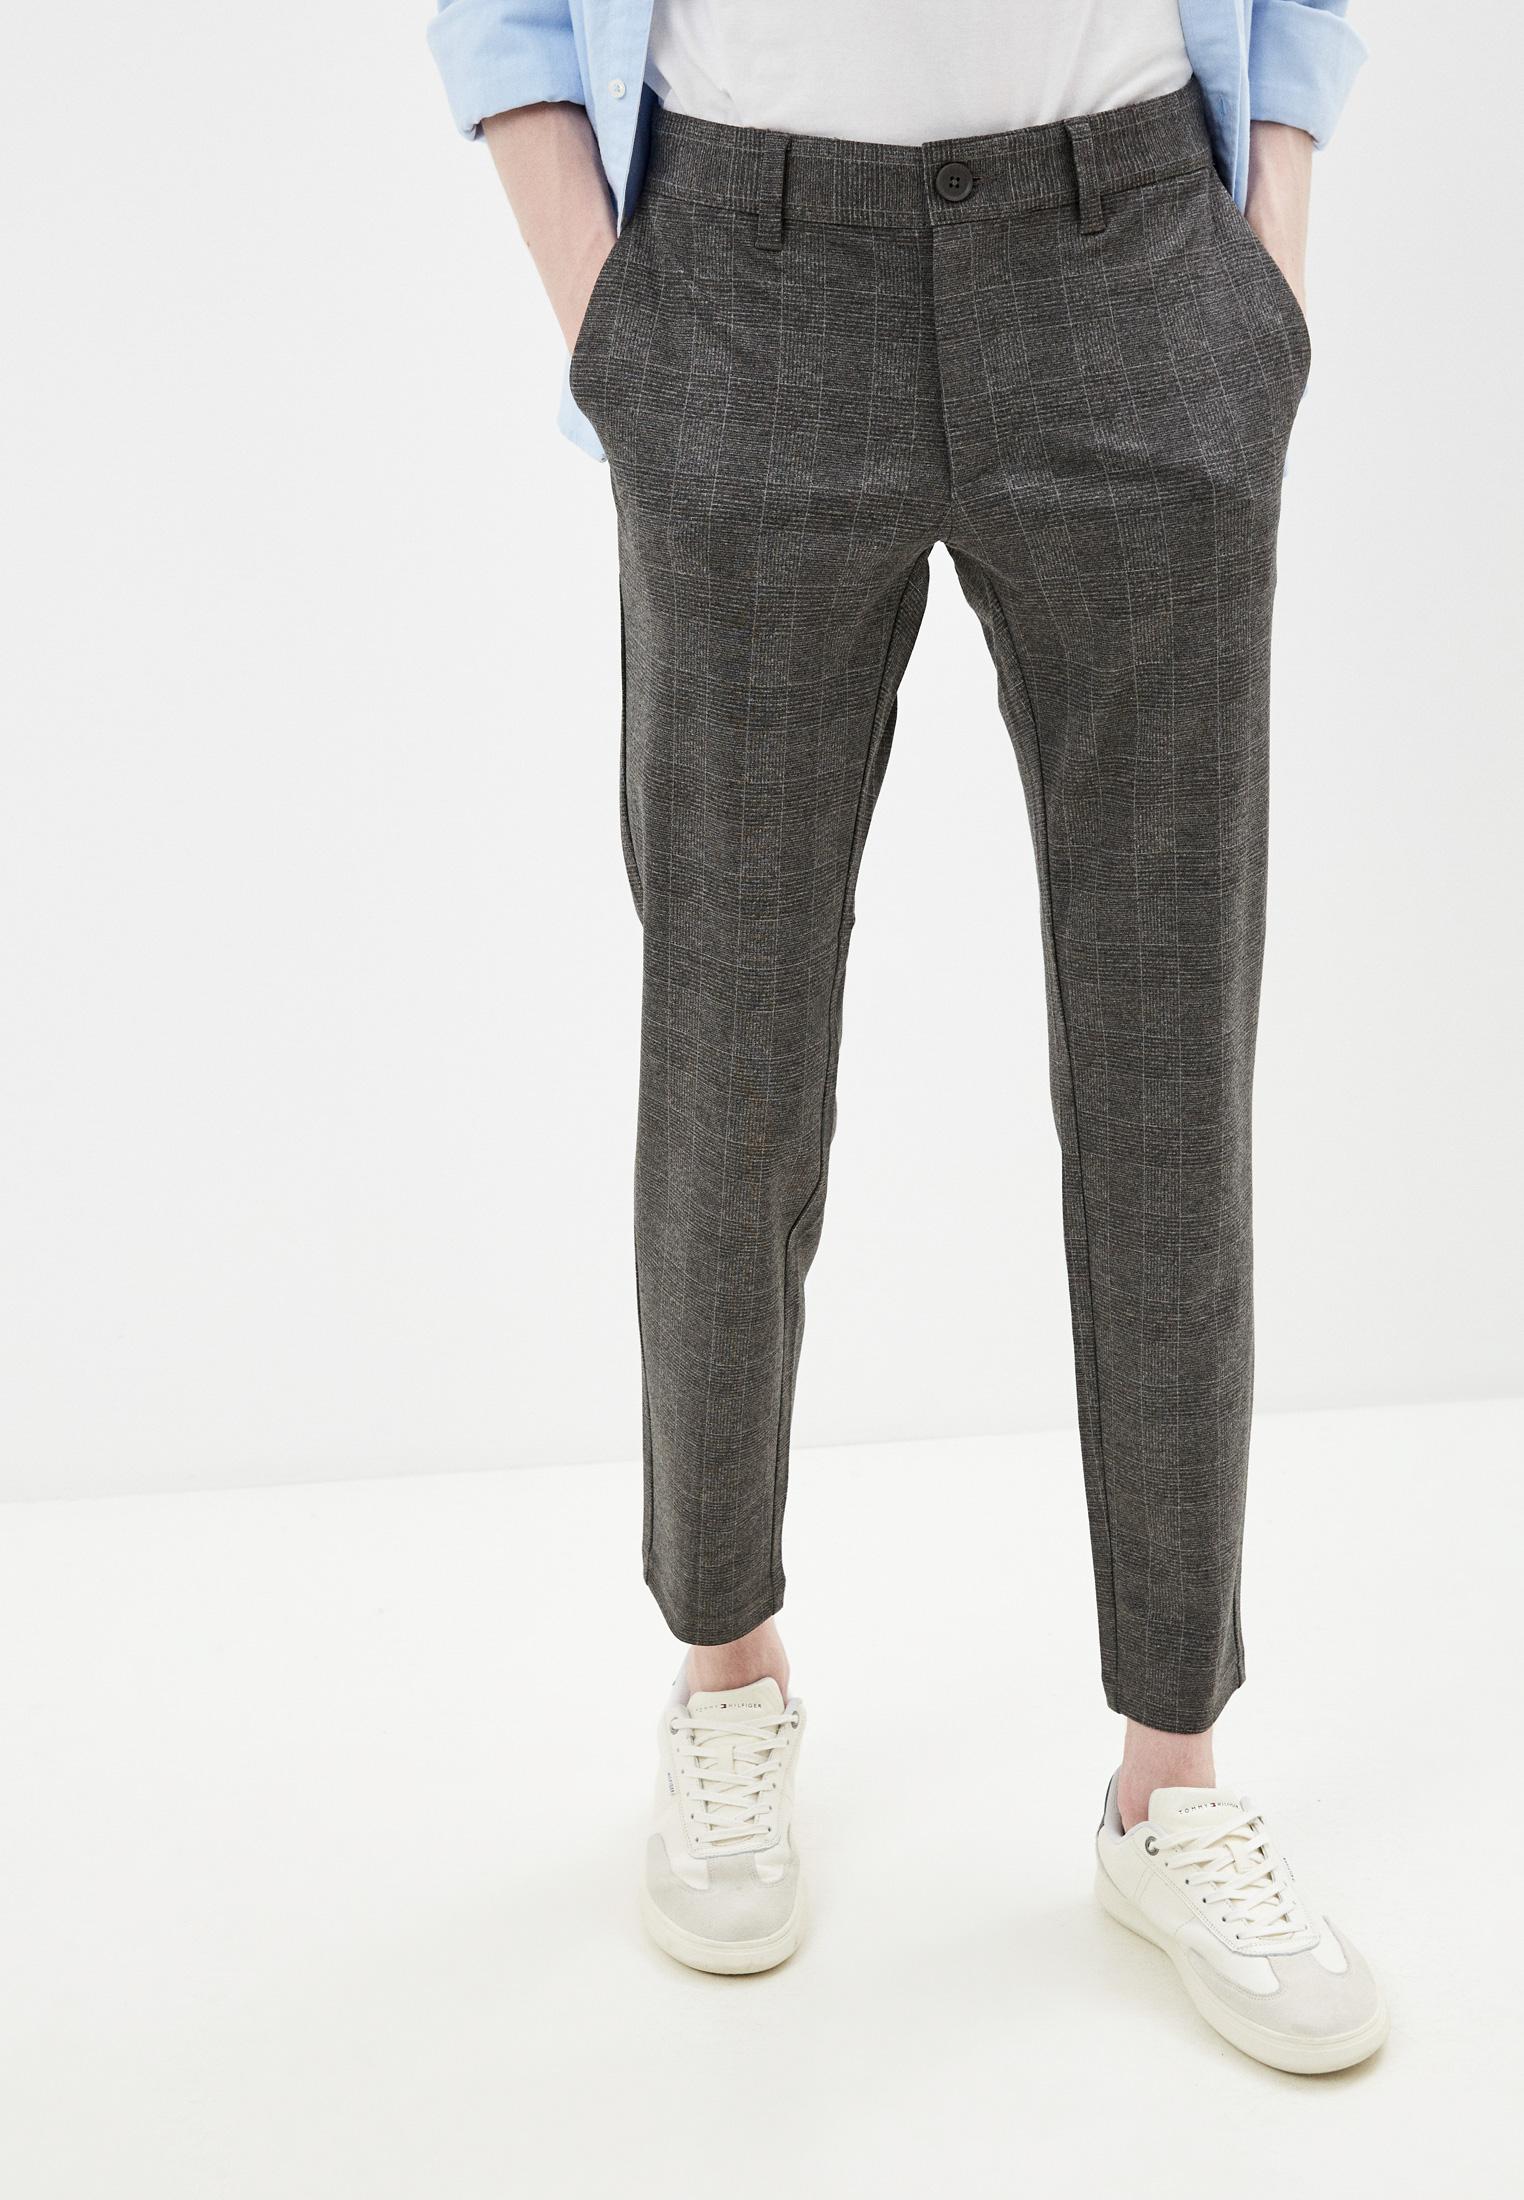 Мужские классические брюки Only & Sons (Онли Энд Санс) Брюки Only & Sons